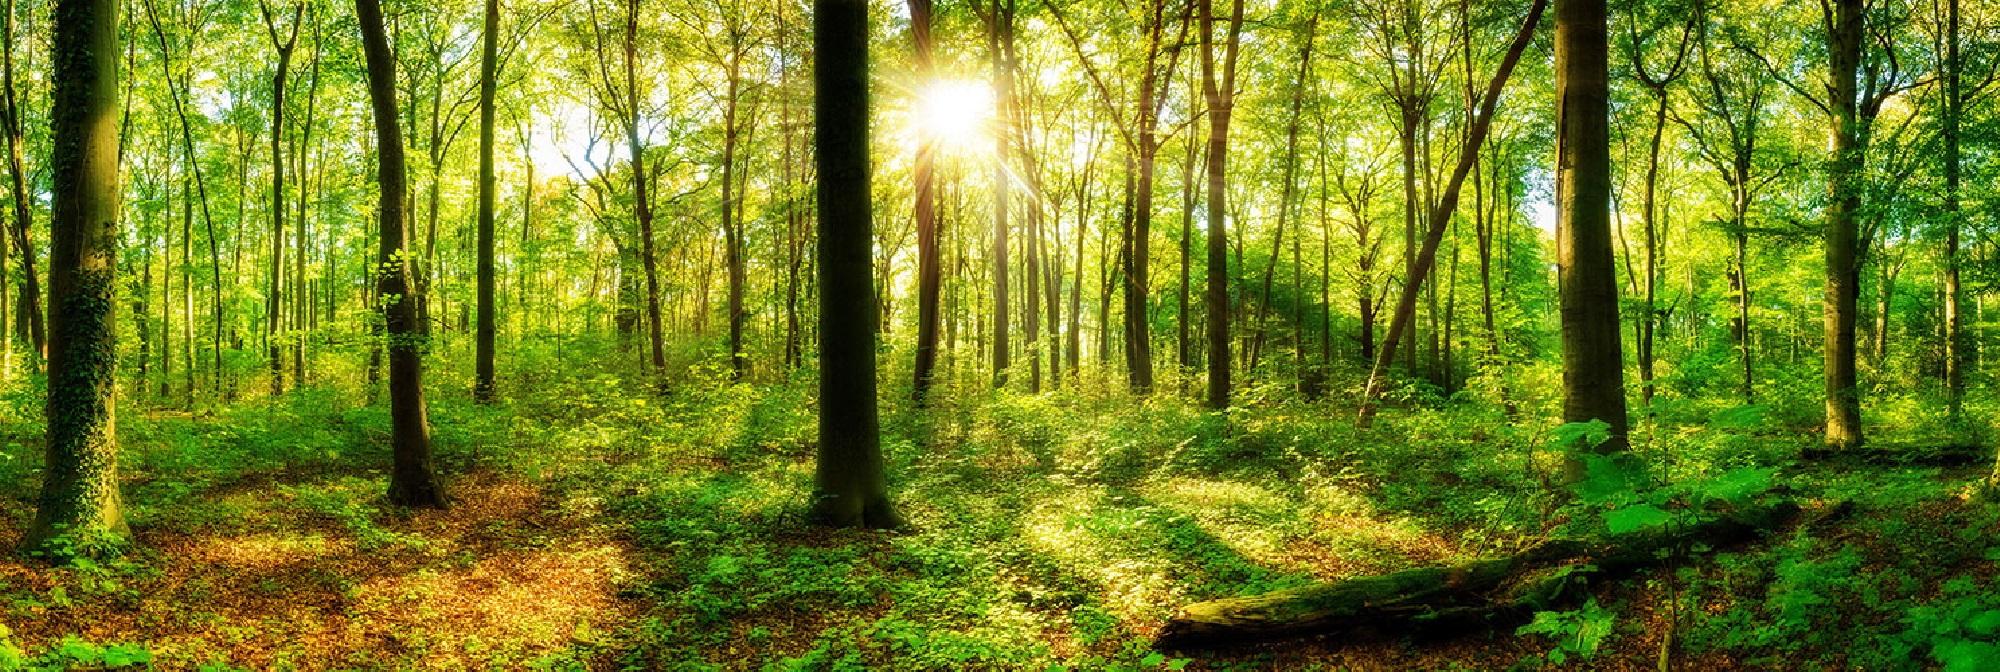 Bestattungsarten Friedwaldbestattung, Baumbestattung